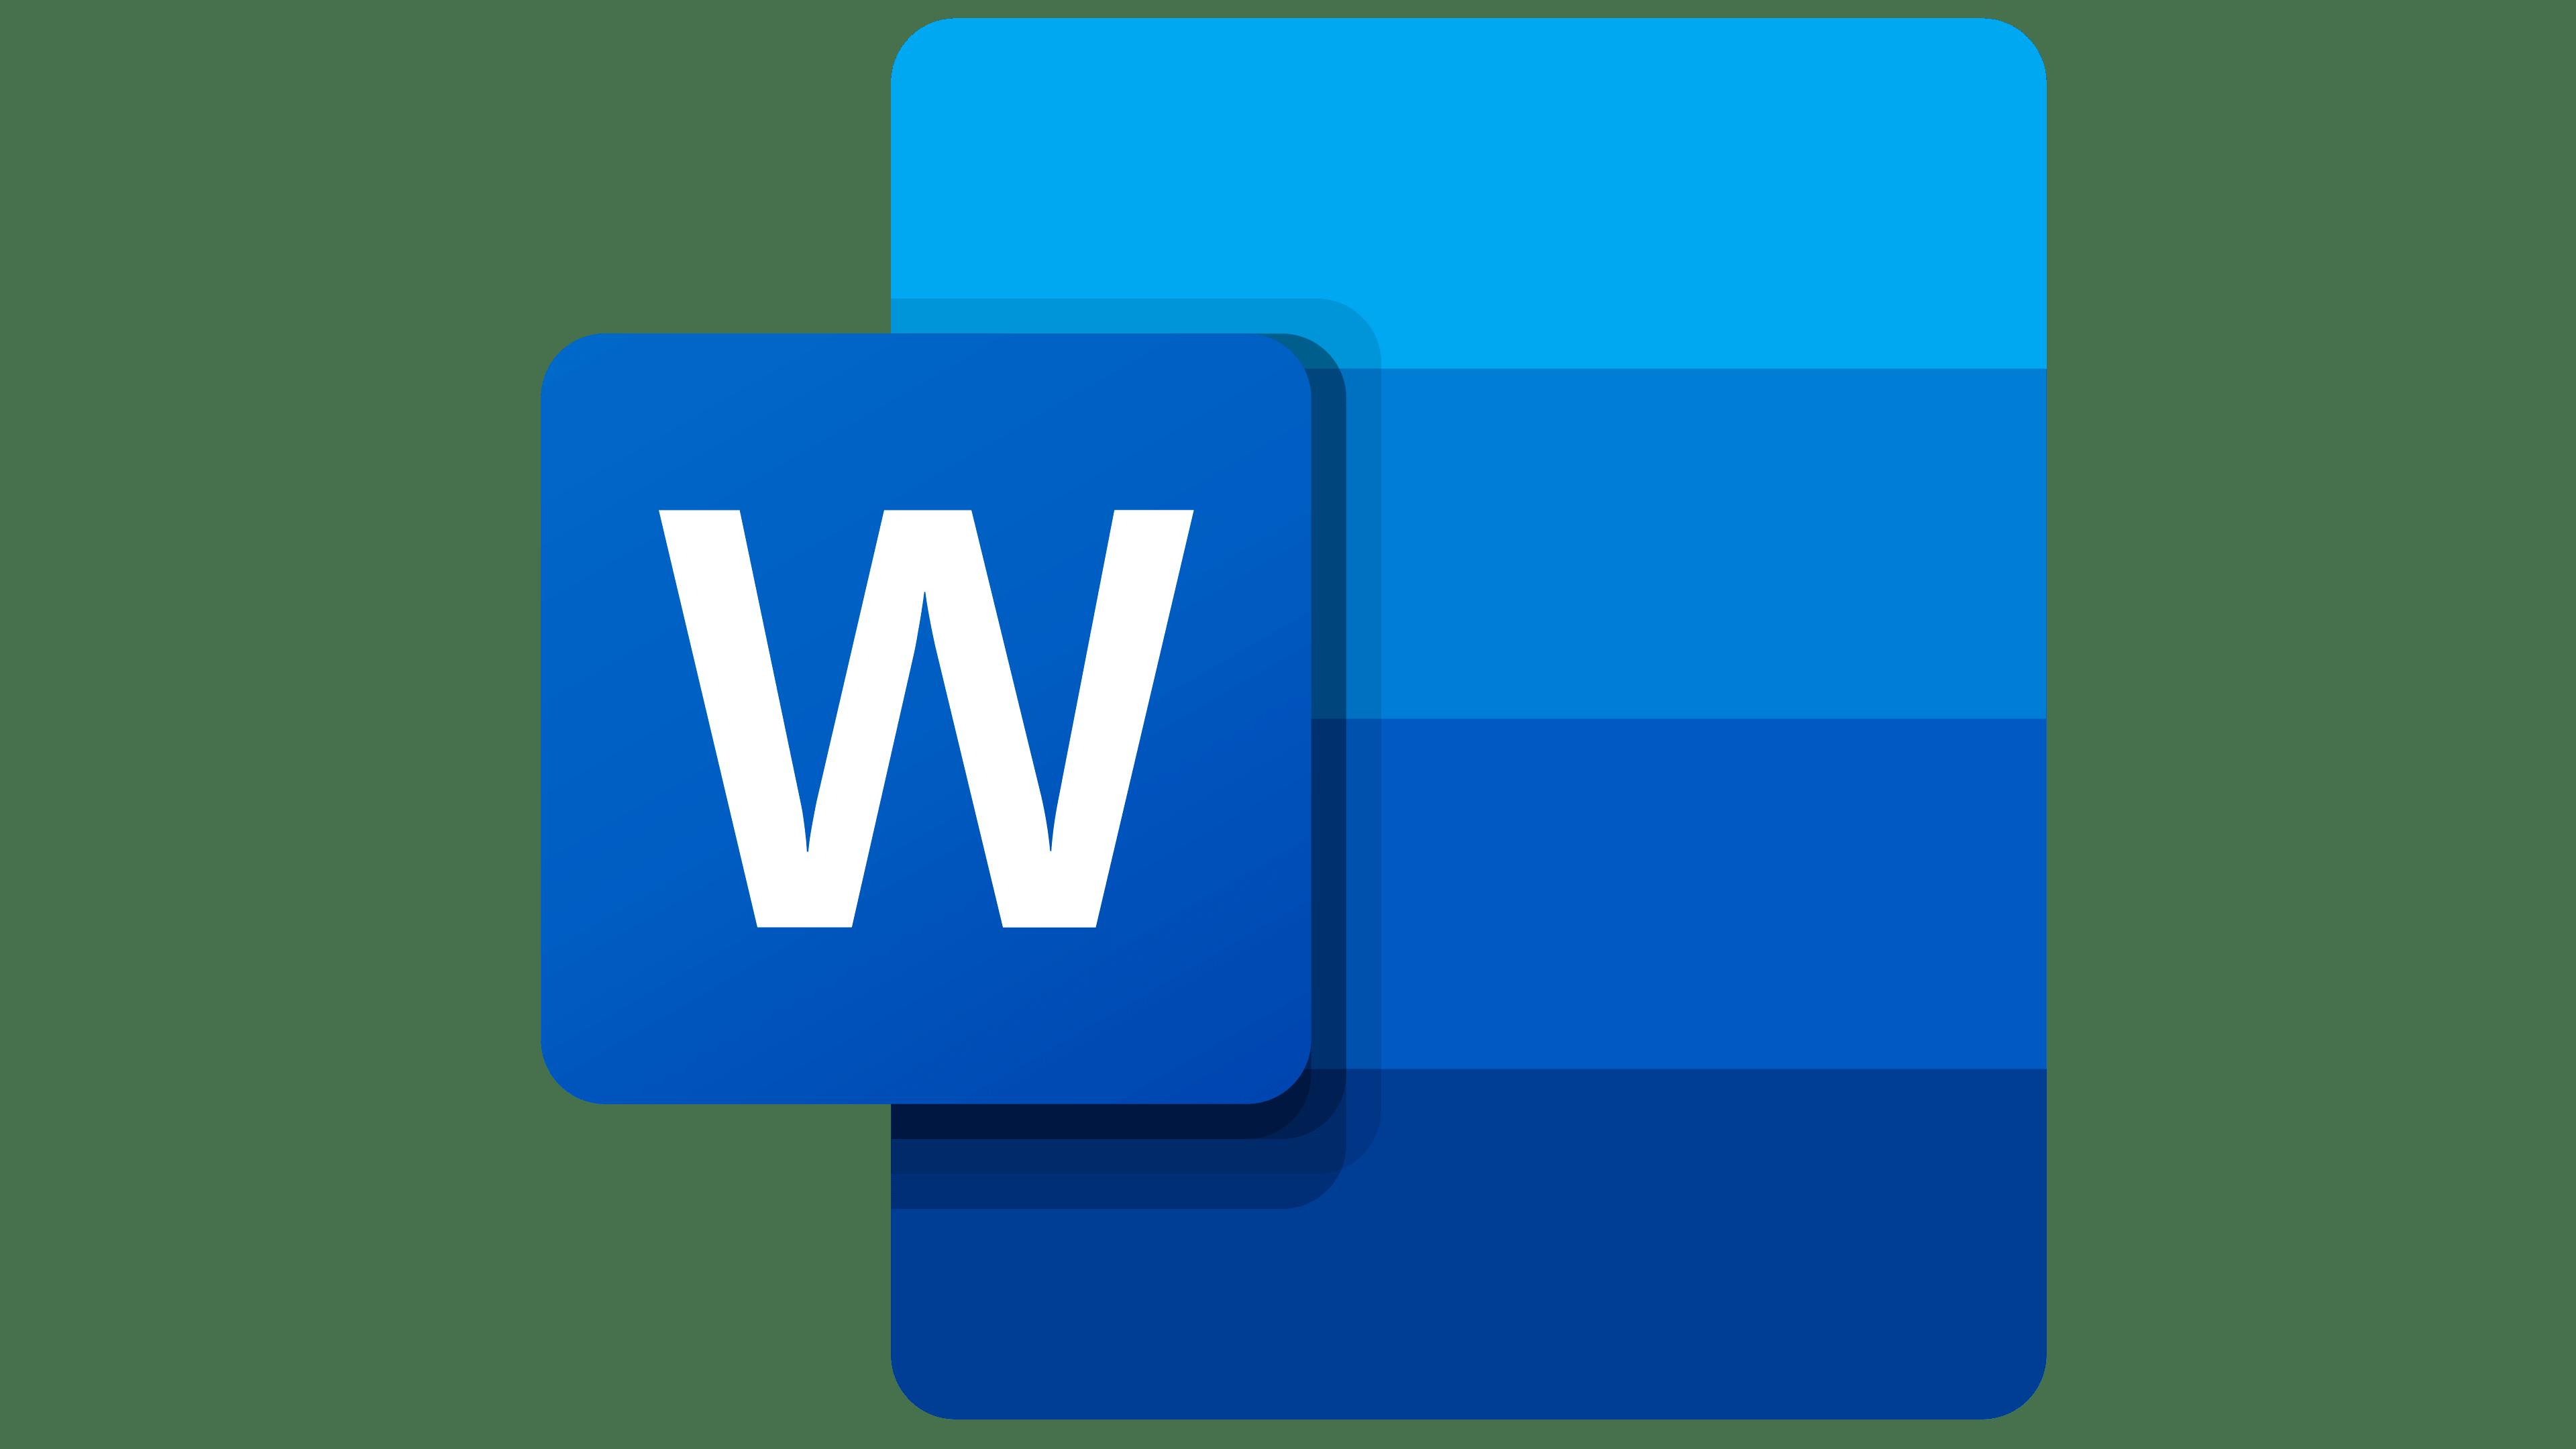 Microsoft-Word-Logo - یوتایپ